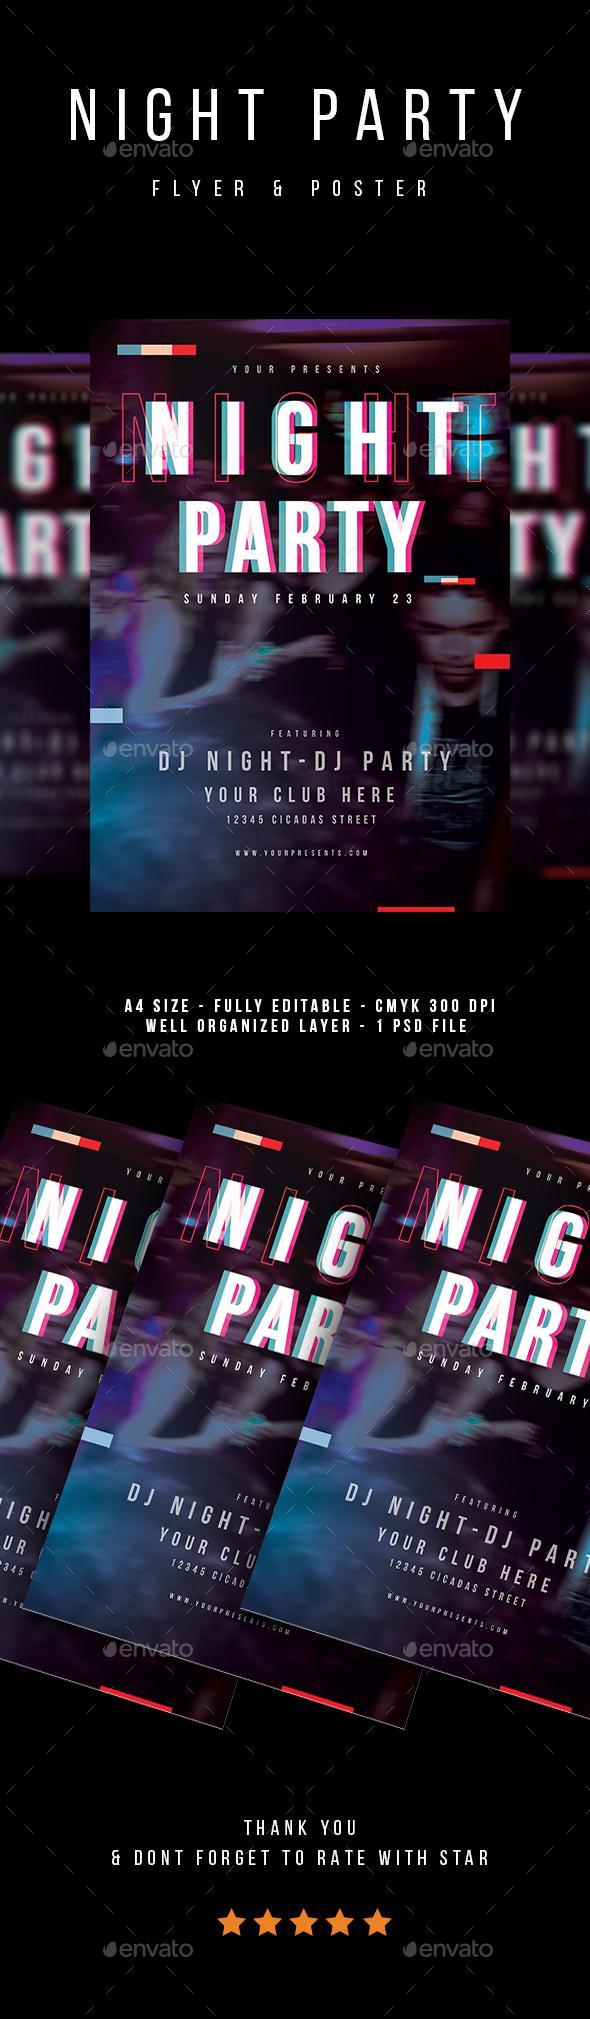 Night Party Flyer - Flyers Print Templates